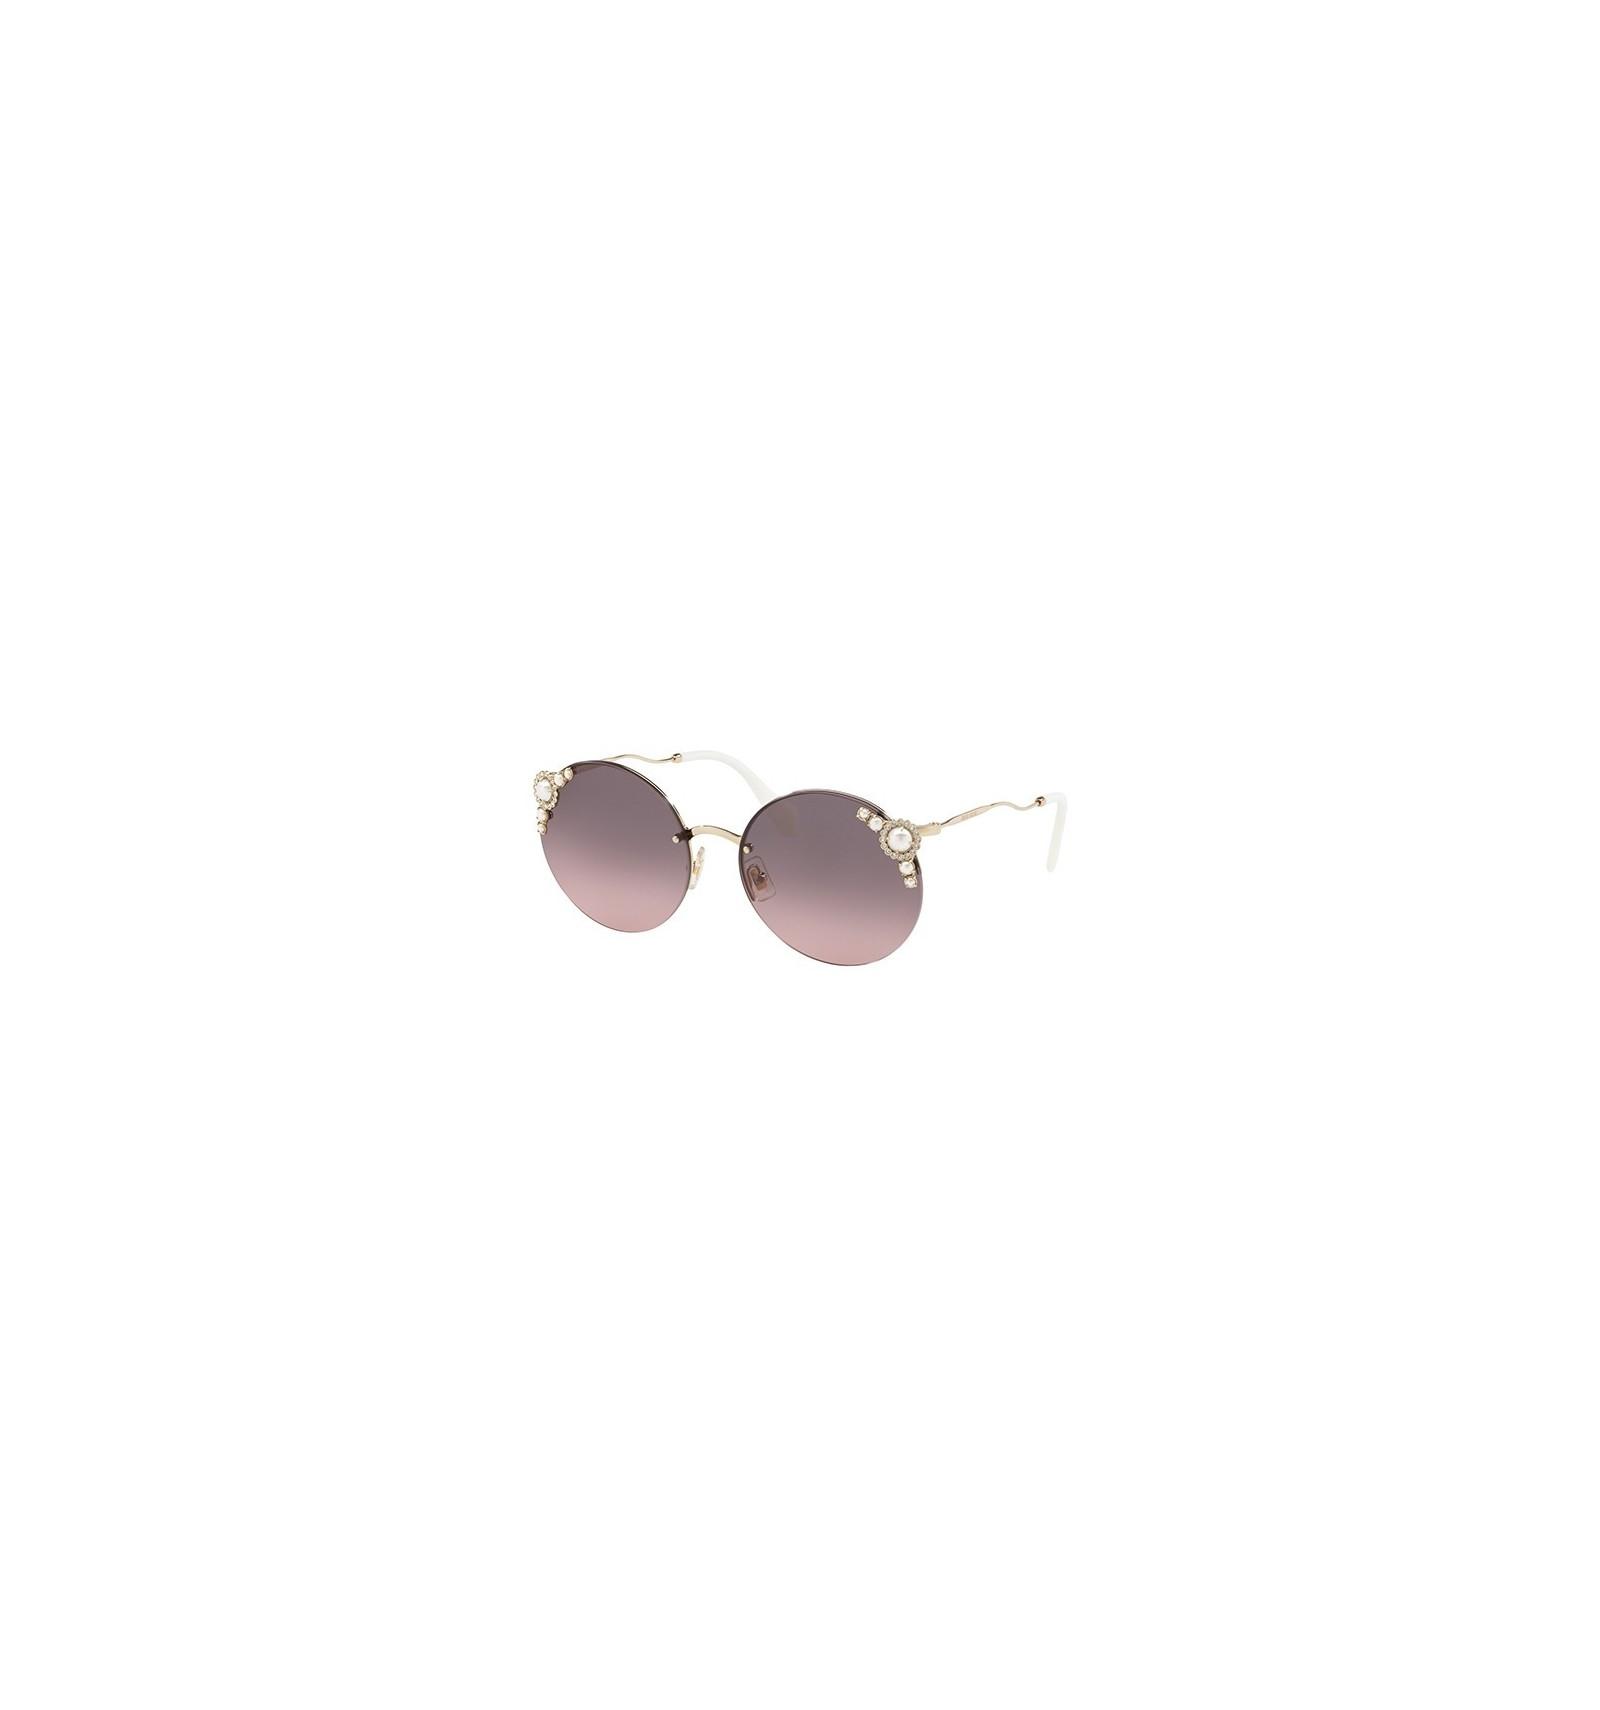 588afde0a4568 Gafas de sol MIU MIU SMU52TS PEARL COLLECTION Pale Gold - Pink Grey Shaded ( VW7